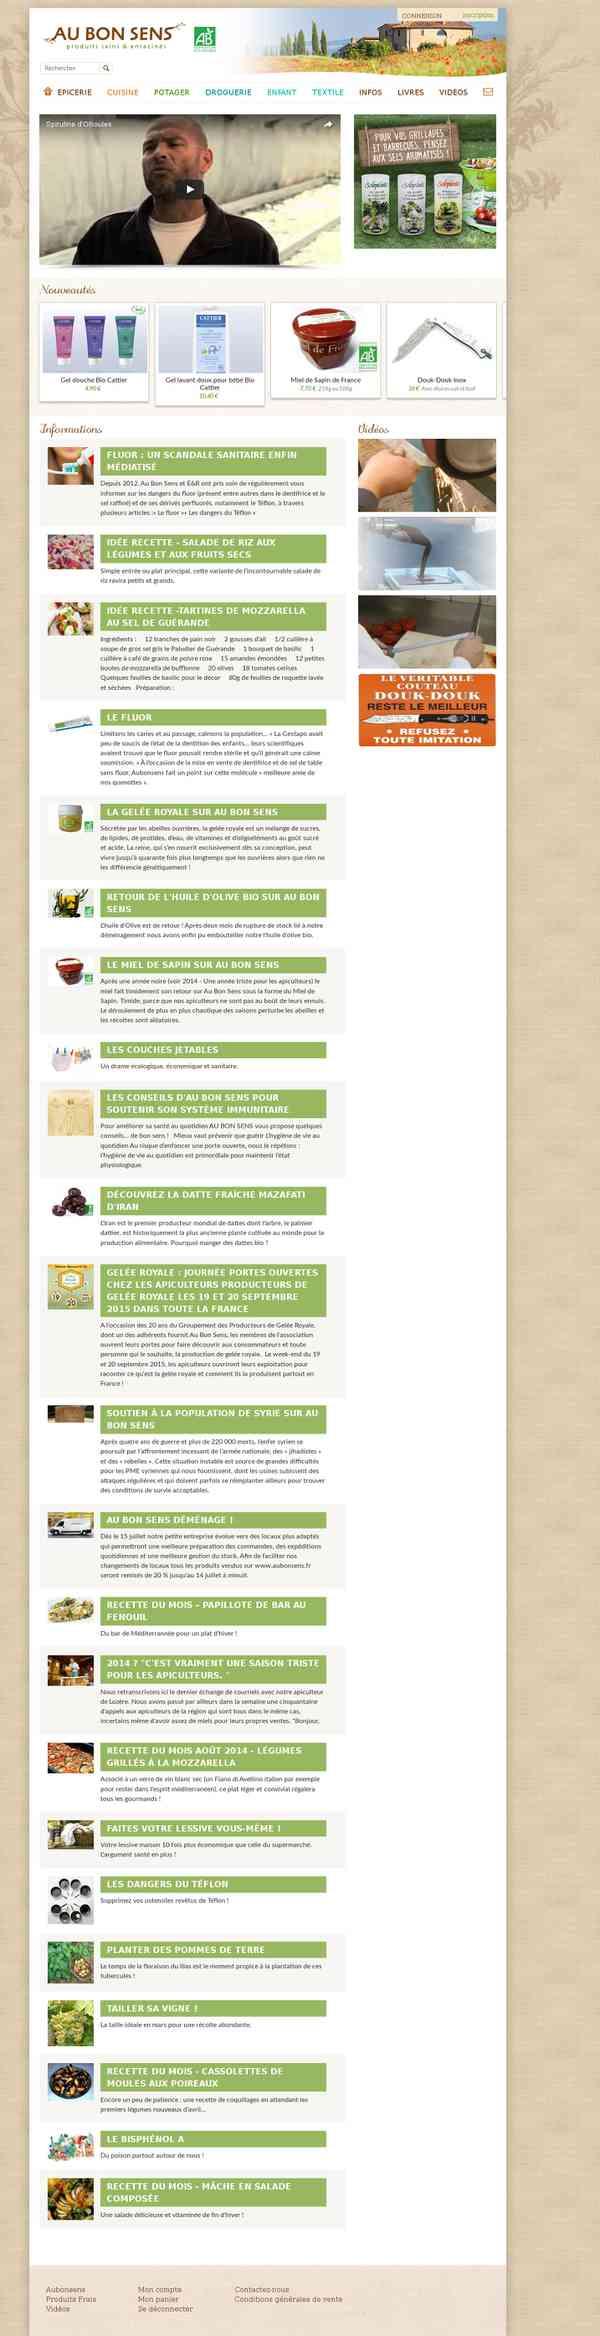 Produits sains & enracinés | Aubonsens